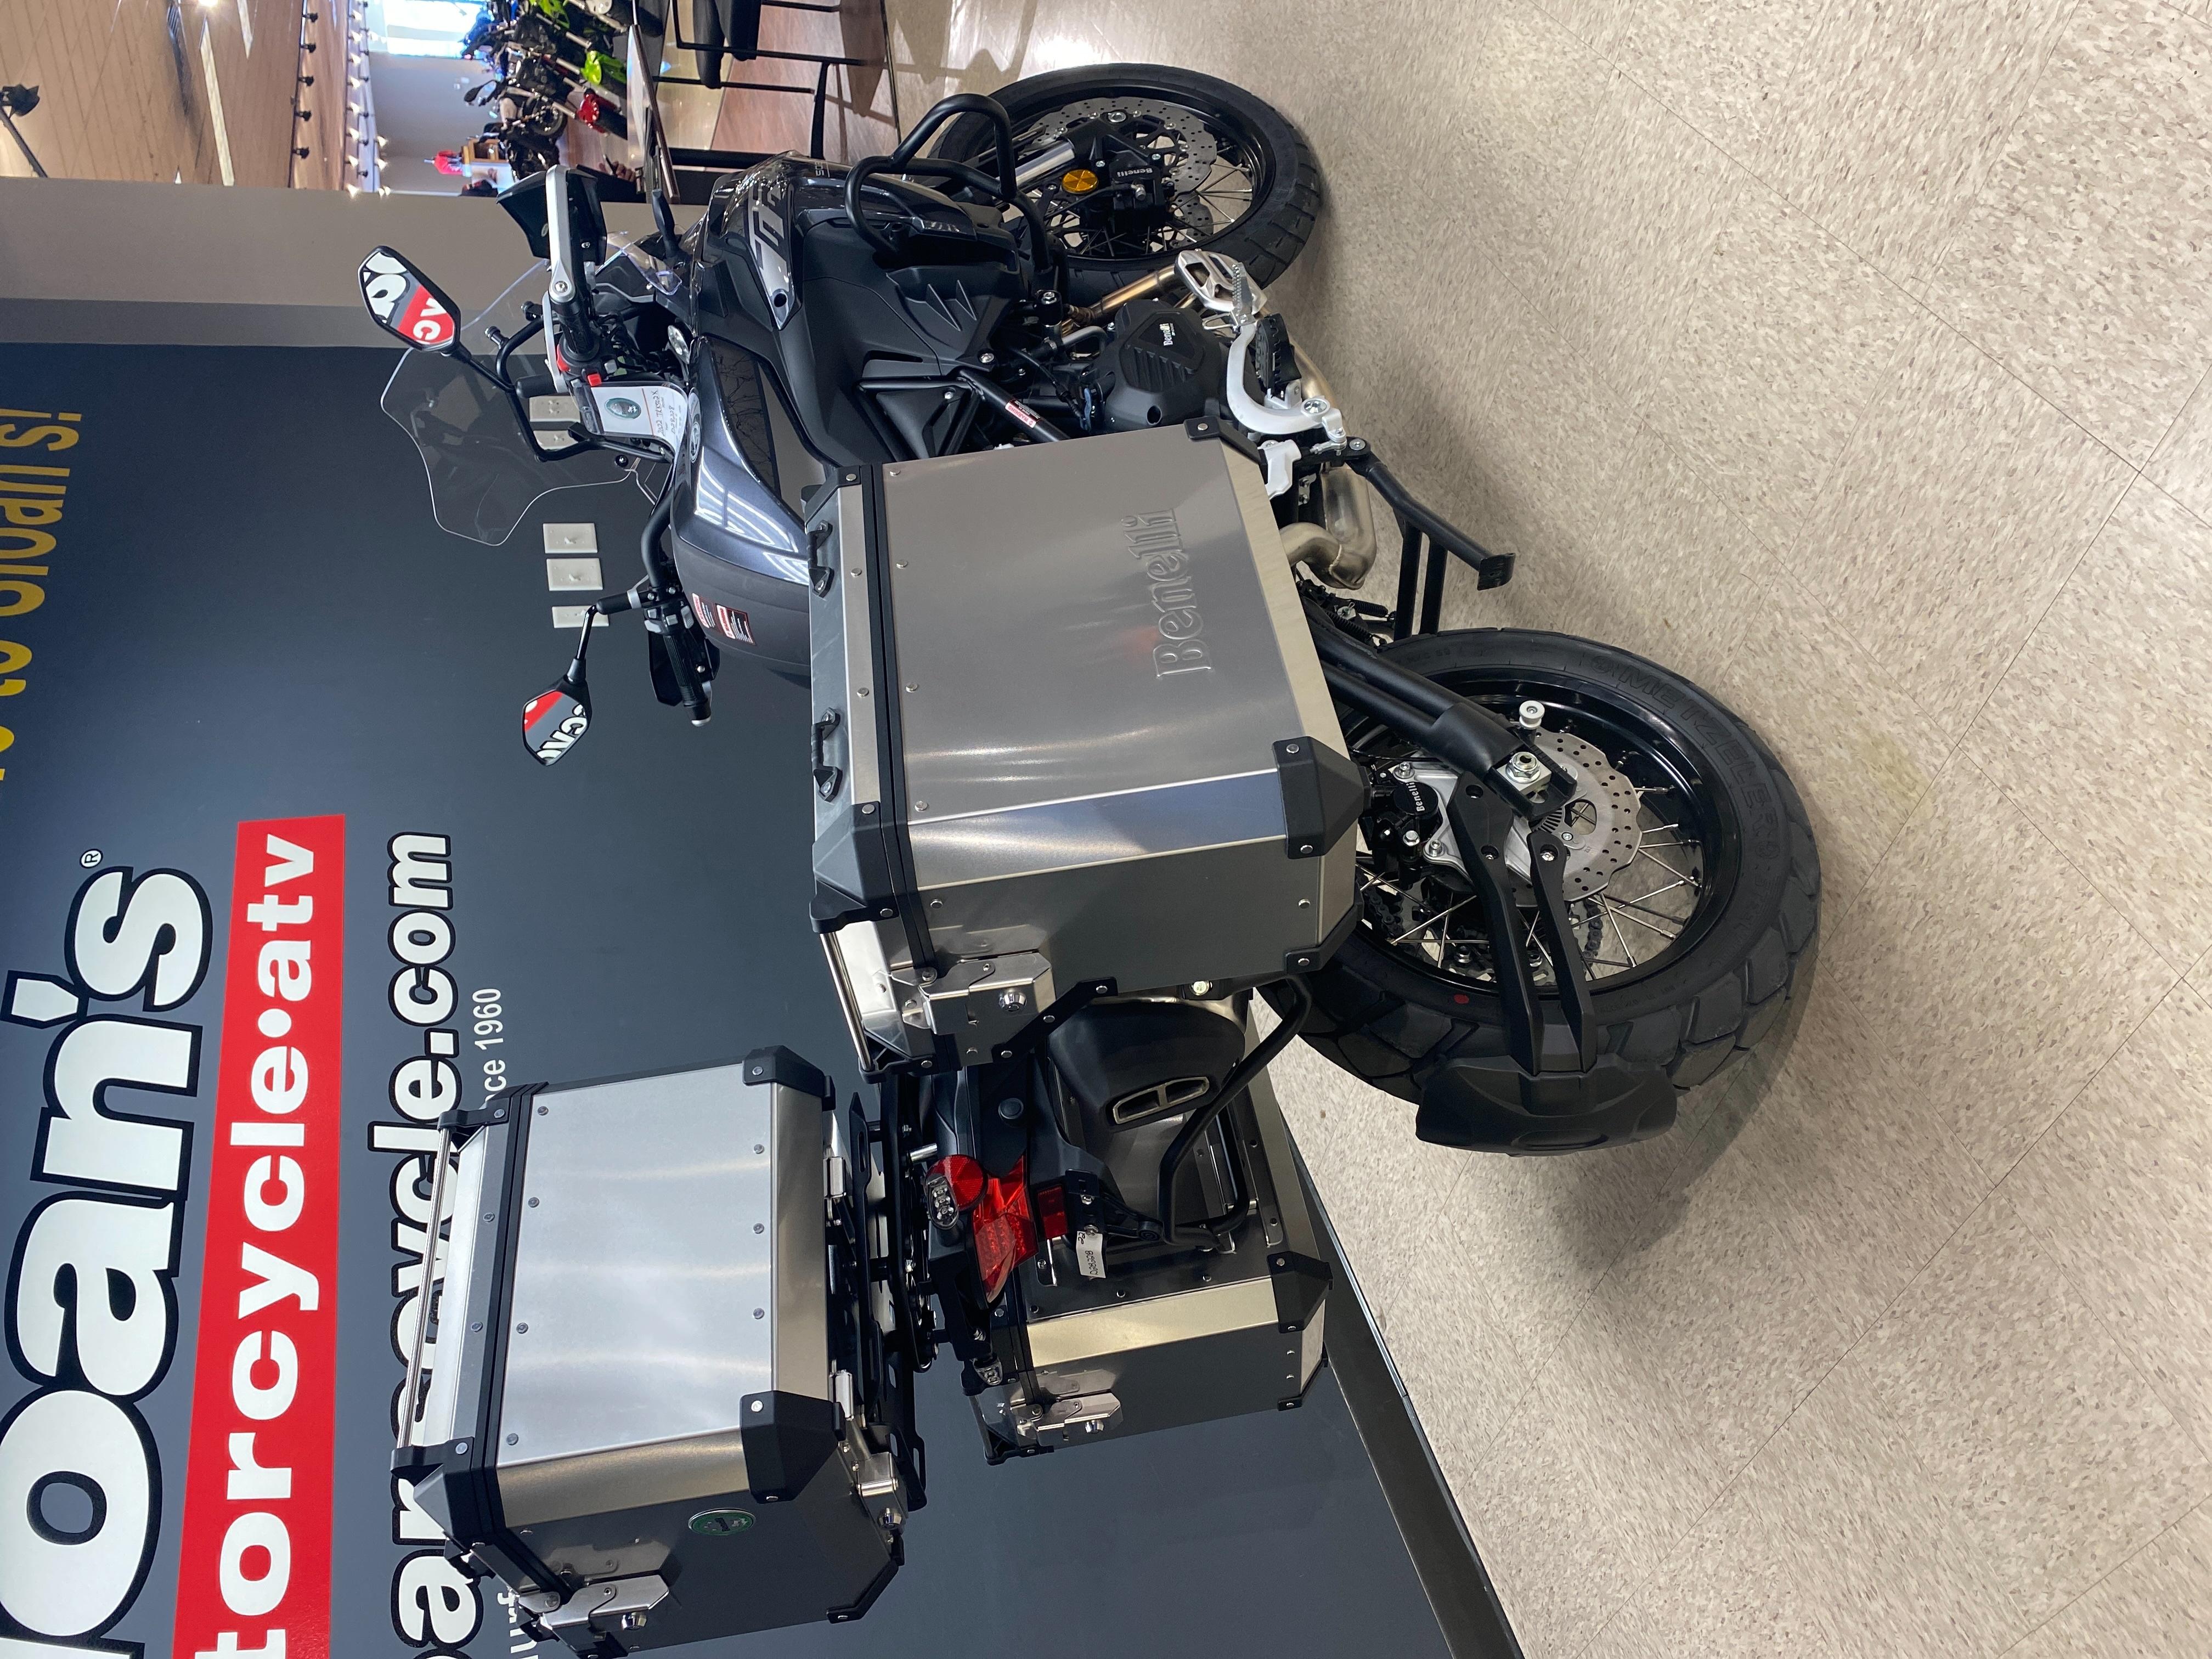 2022 Benelli TRK 502 X at Sloans Motorcycle ATV, Murfreesboro, TN, 37129